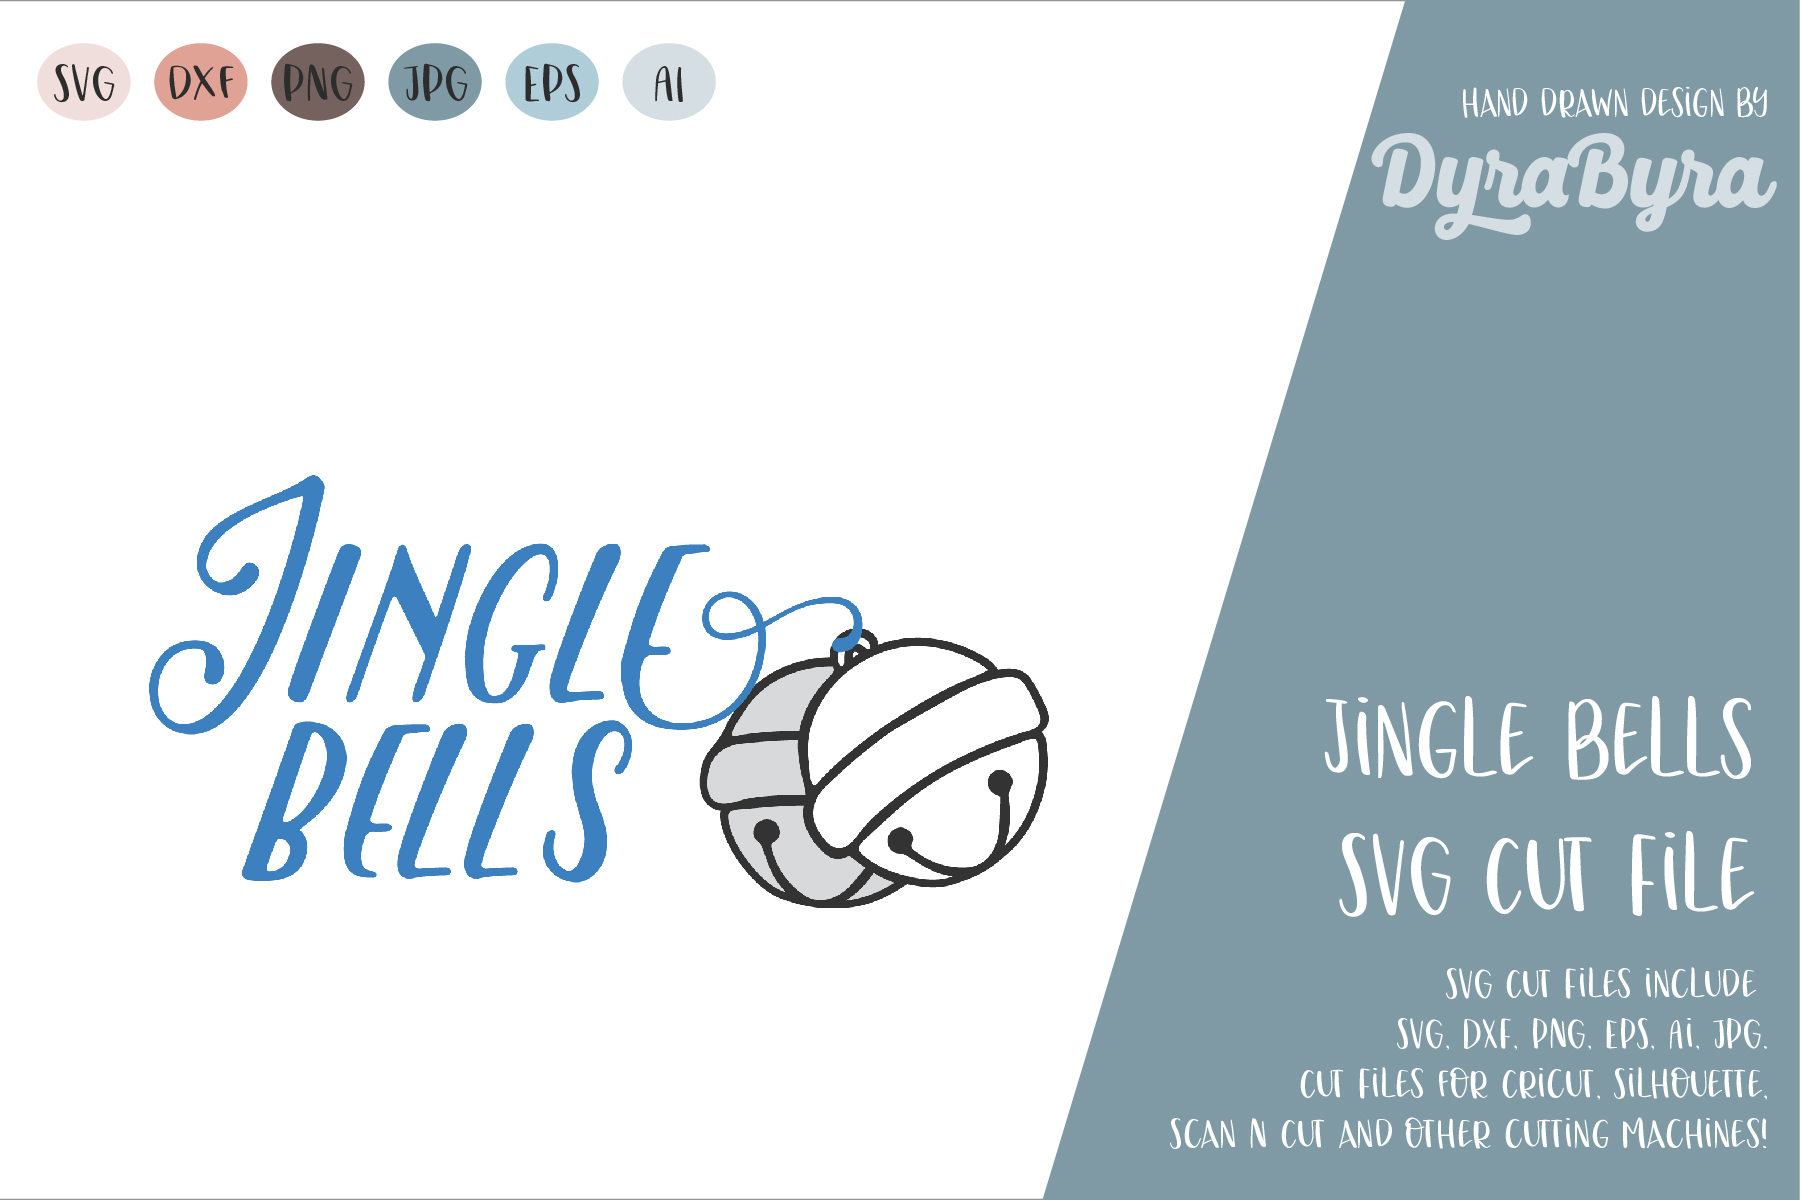 Jingle Bells SVG / Christmas SVG Cut File example image 2